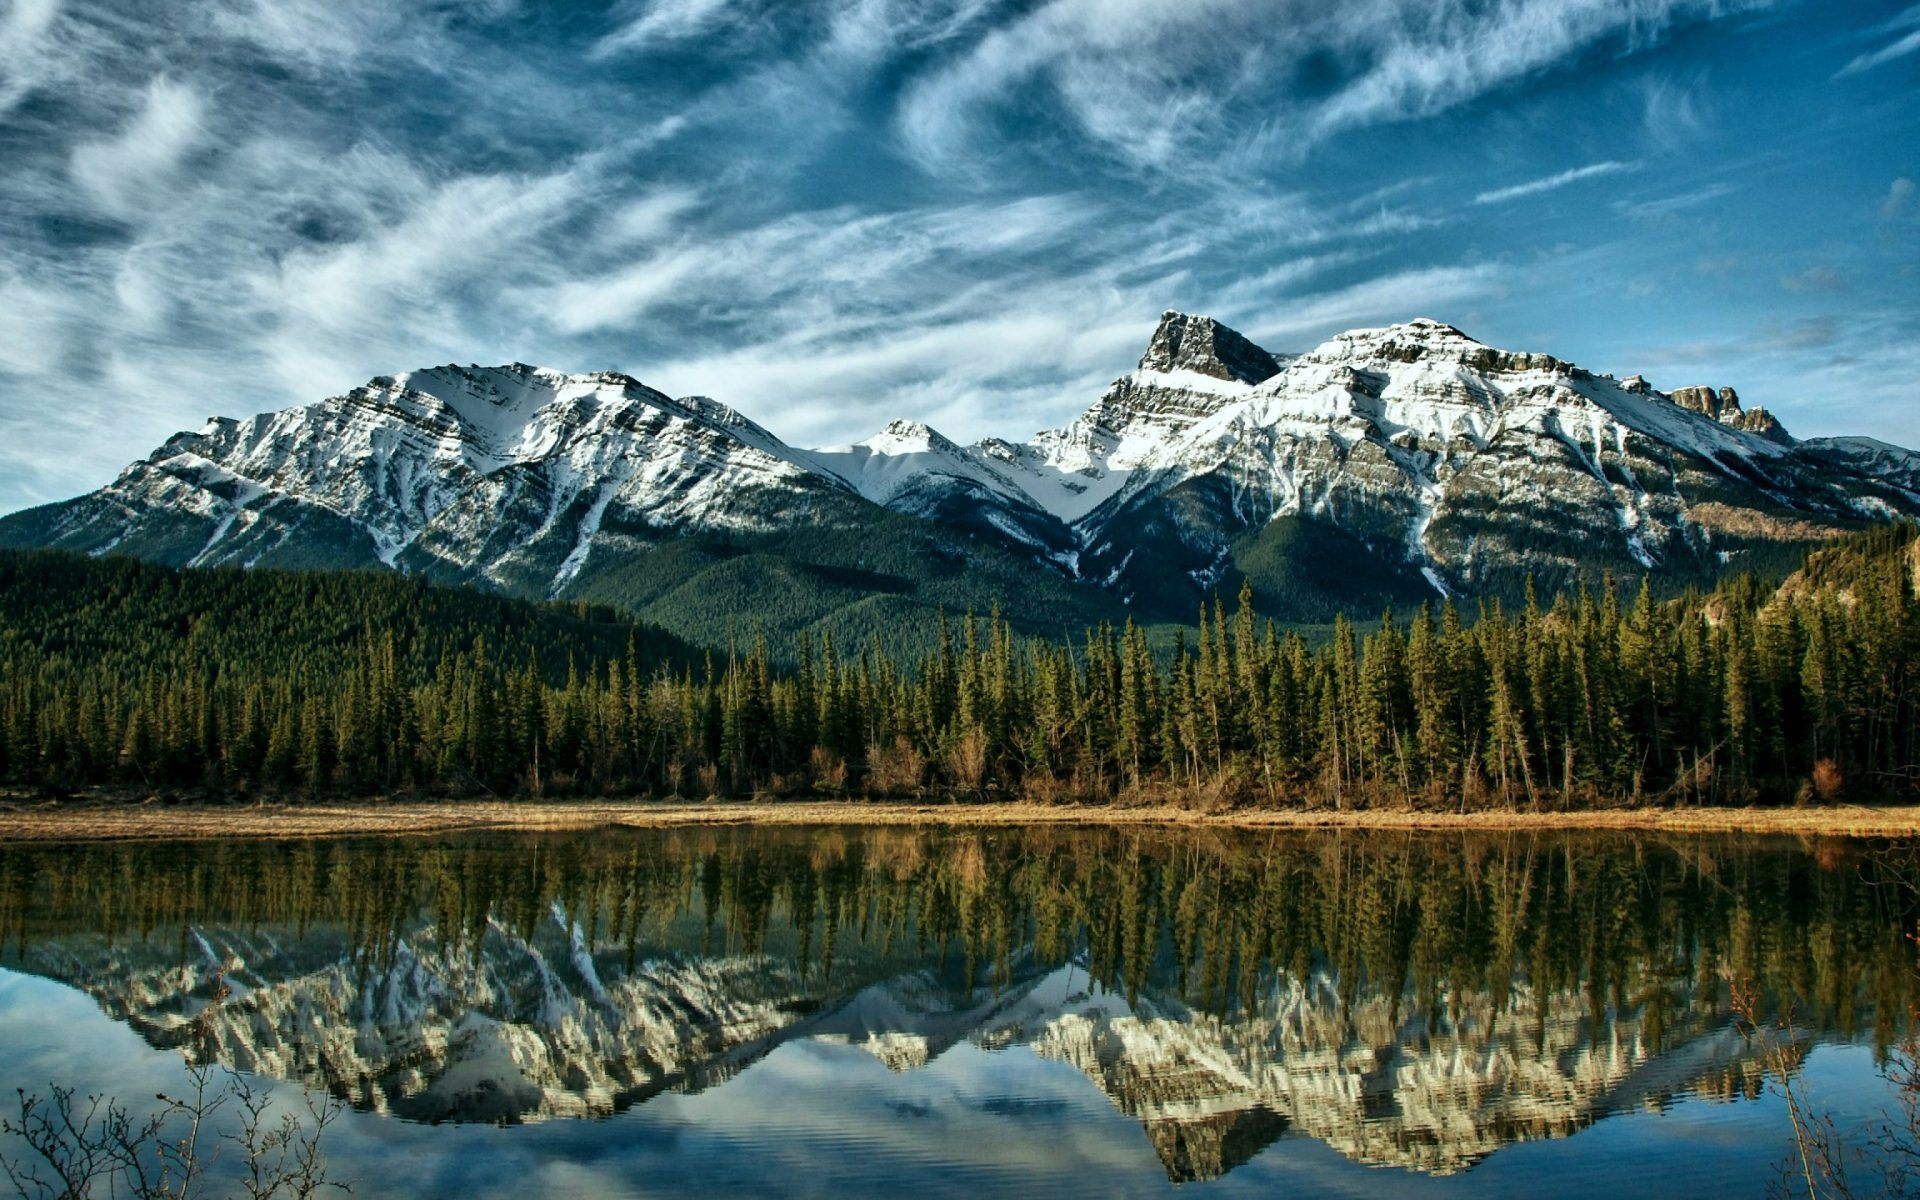 Peaceful Mountain Lake 19201200 Beau Paysage Fond Ecran Paysage Lac